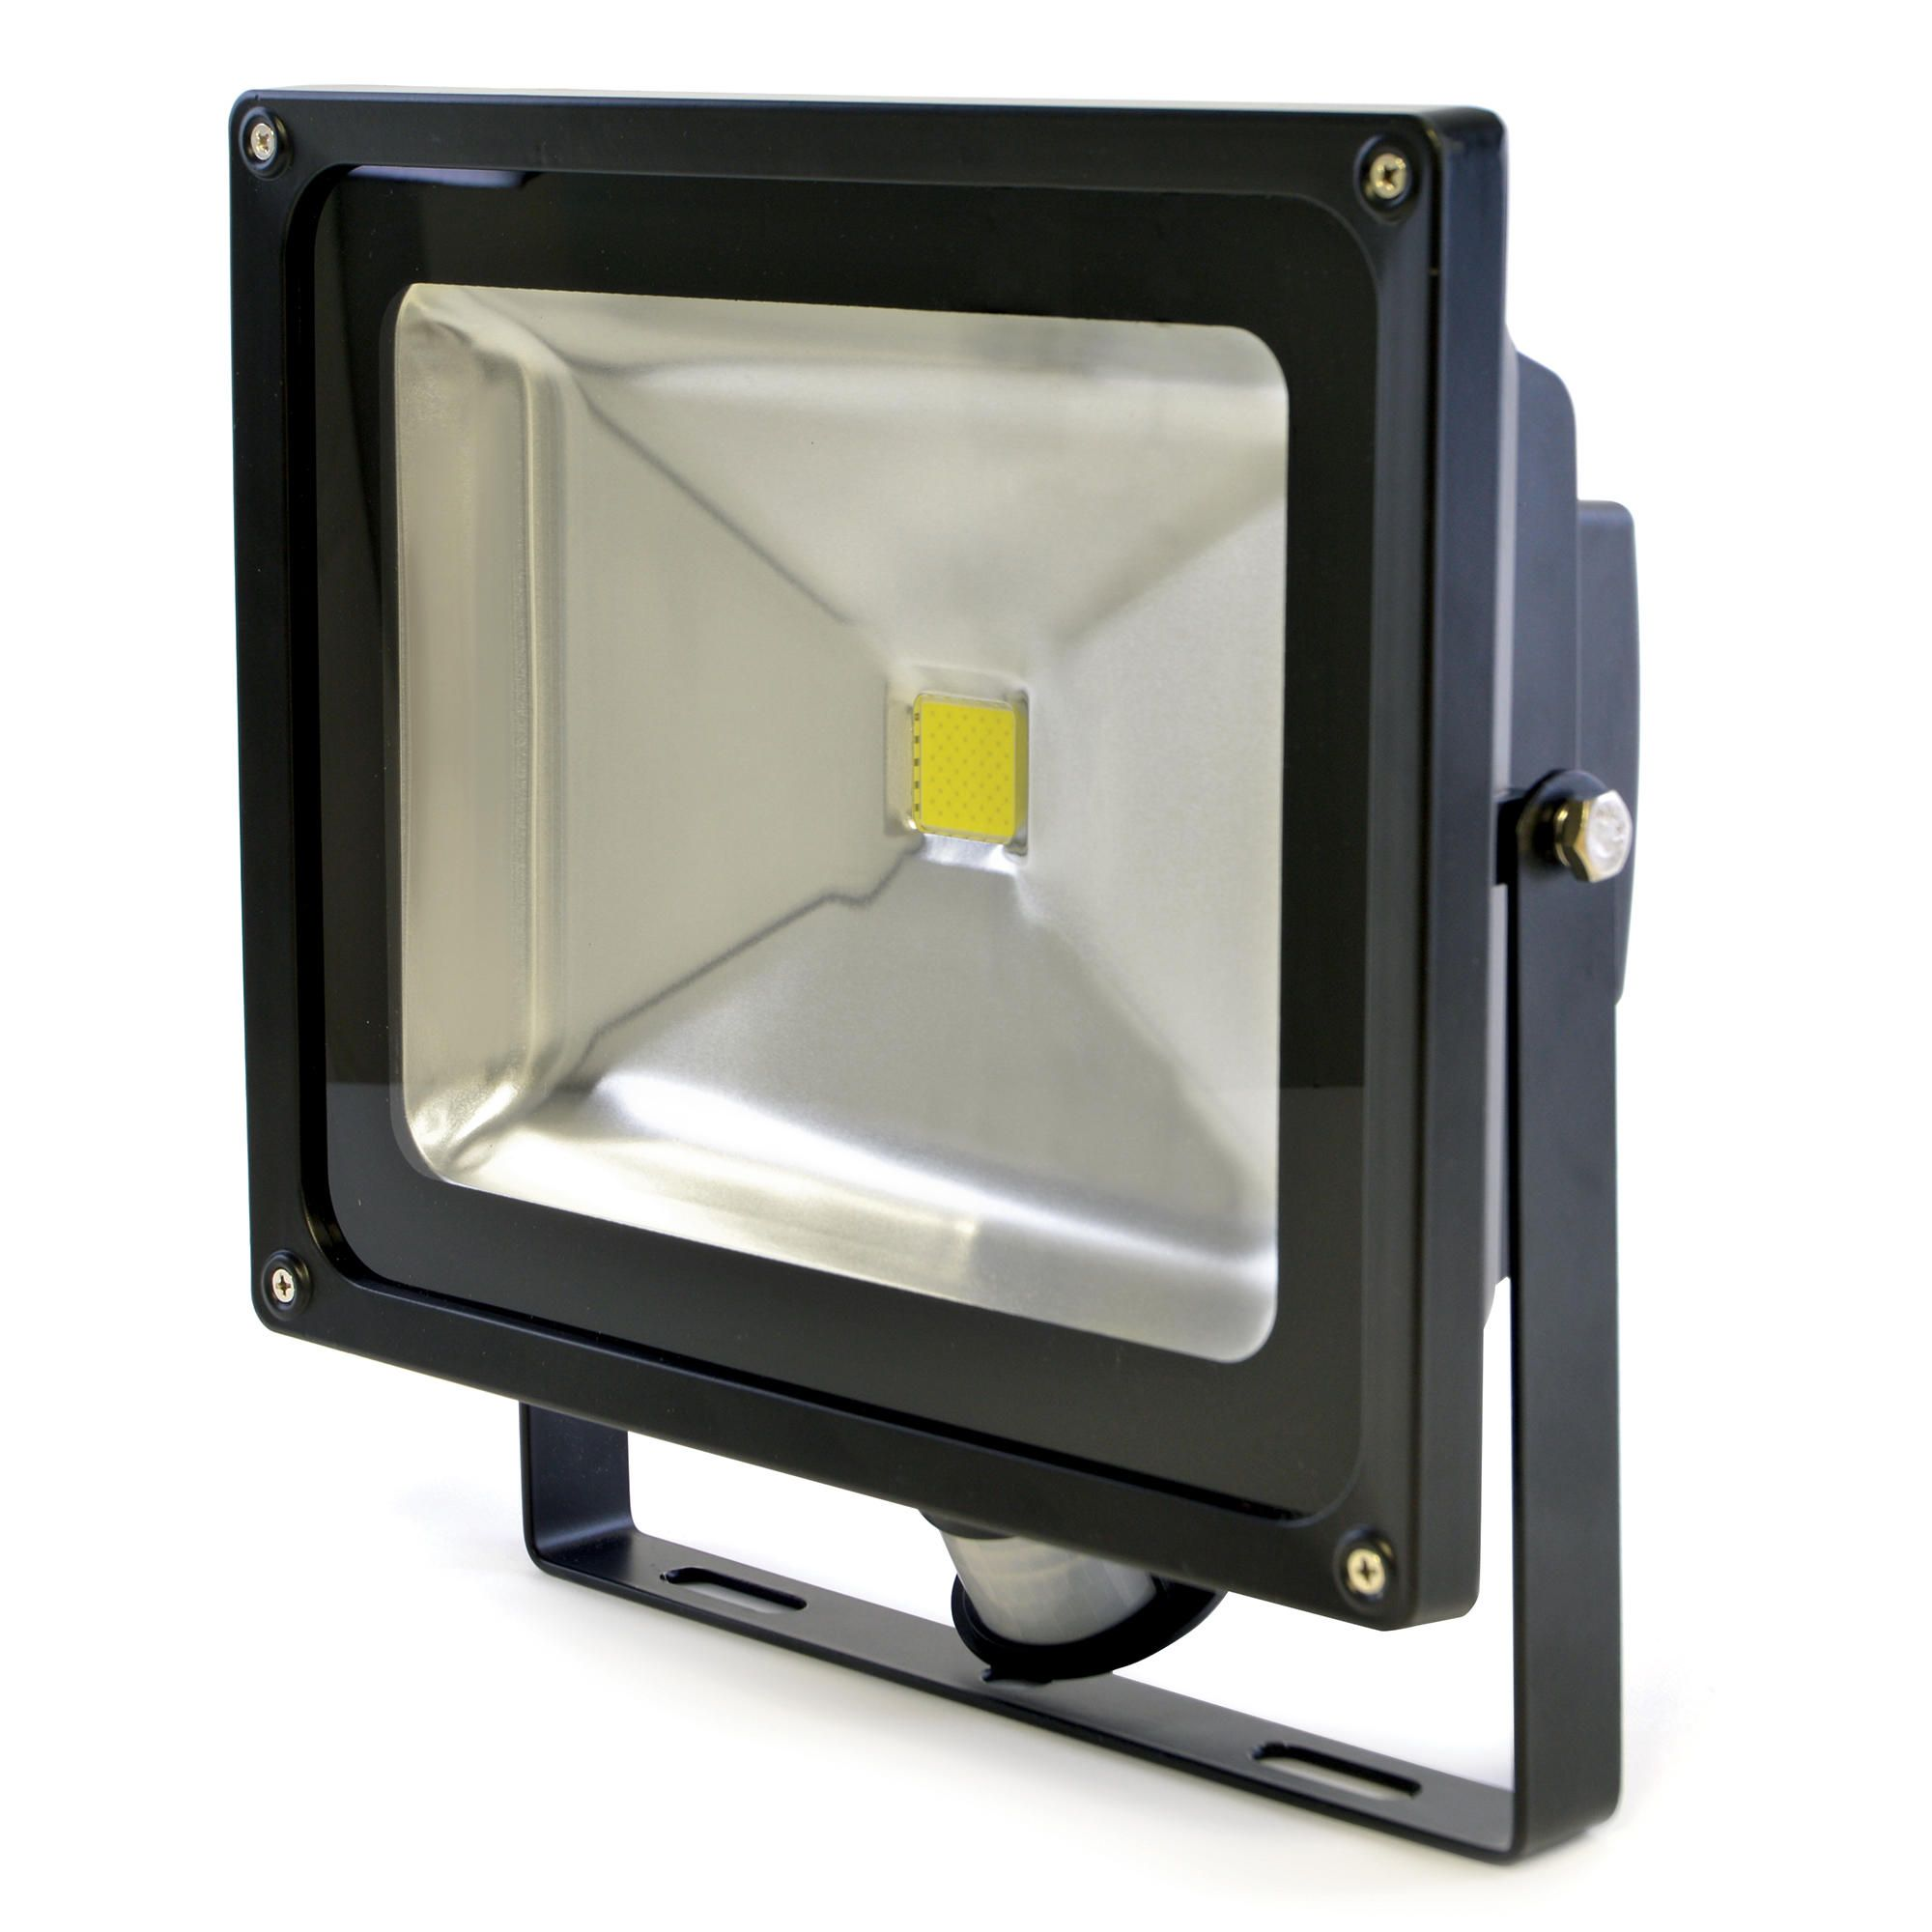 Outdoor LED Security Floodlight With PIR Sensor